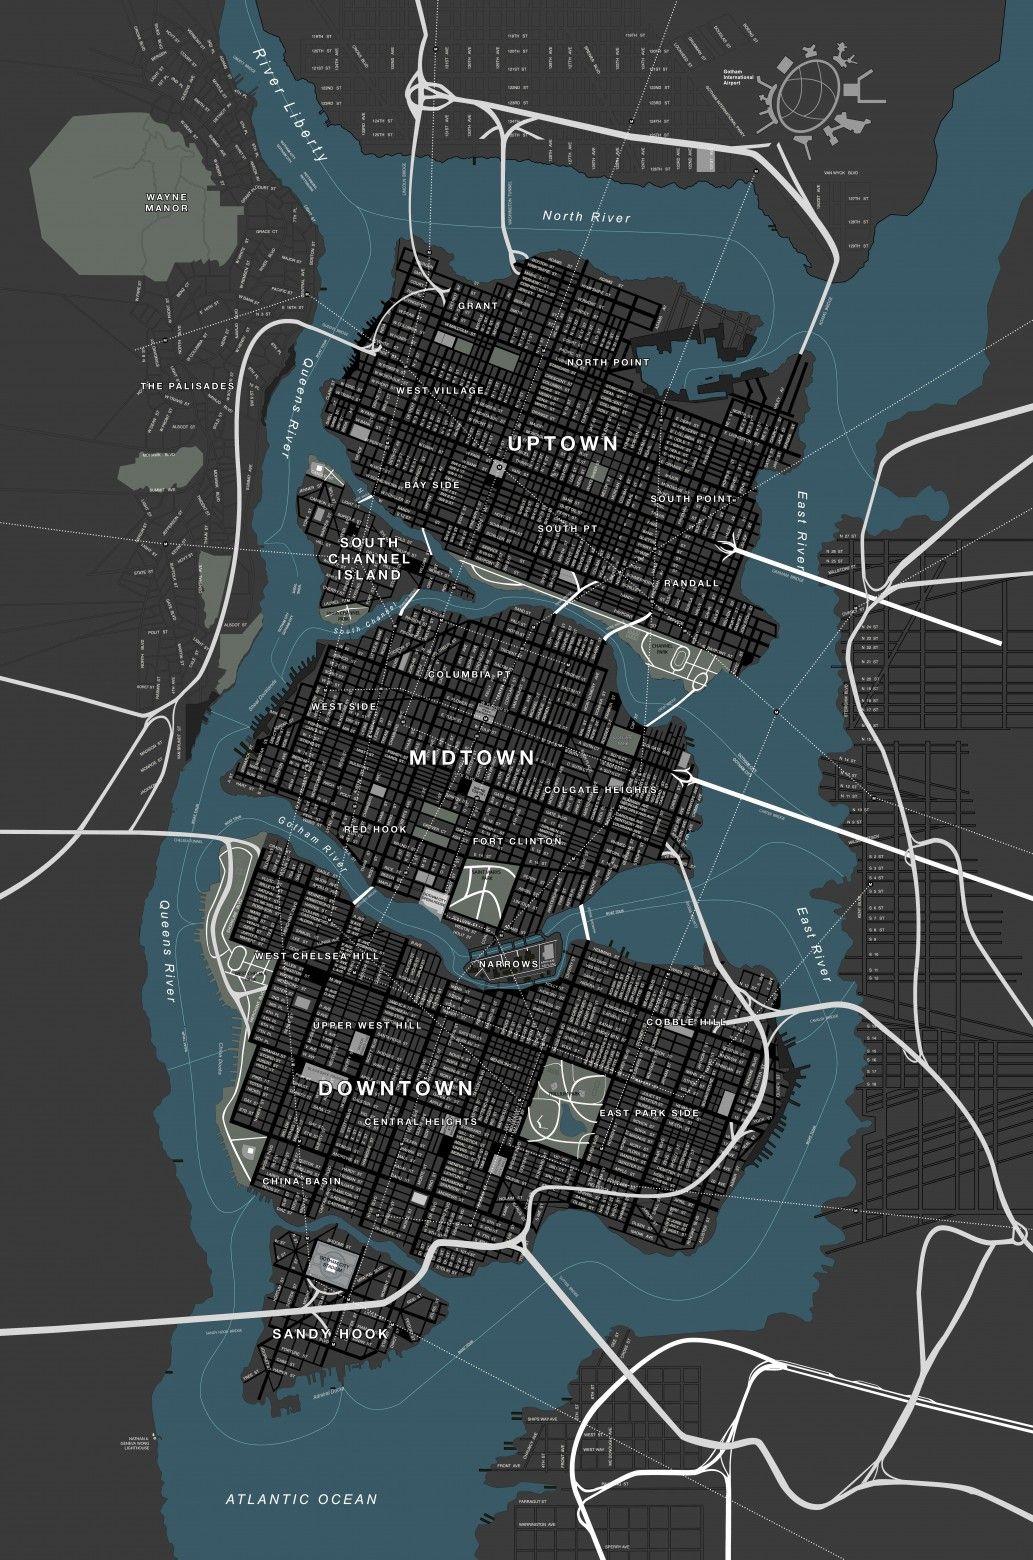 Gotham City, as seen in the Nolan films | DC | Pinterest | Gotham ...